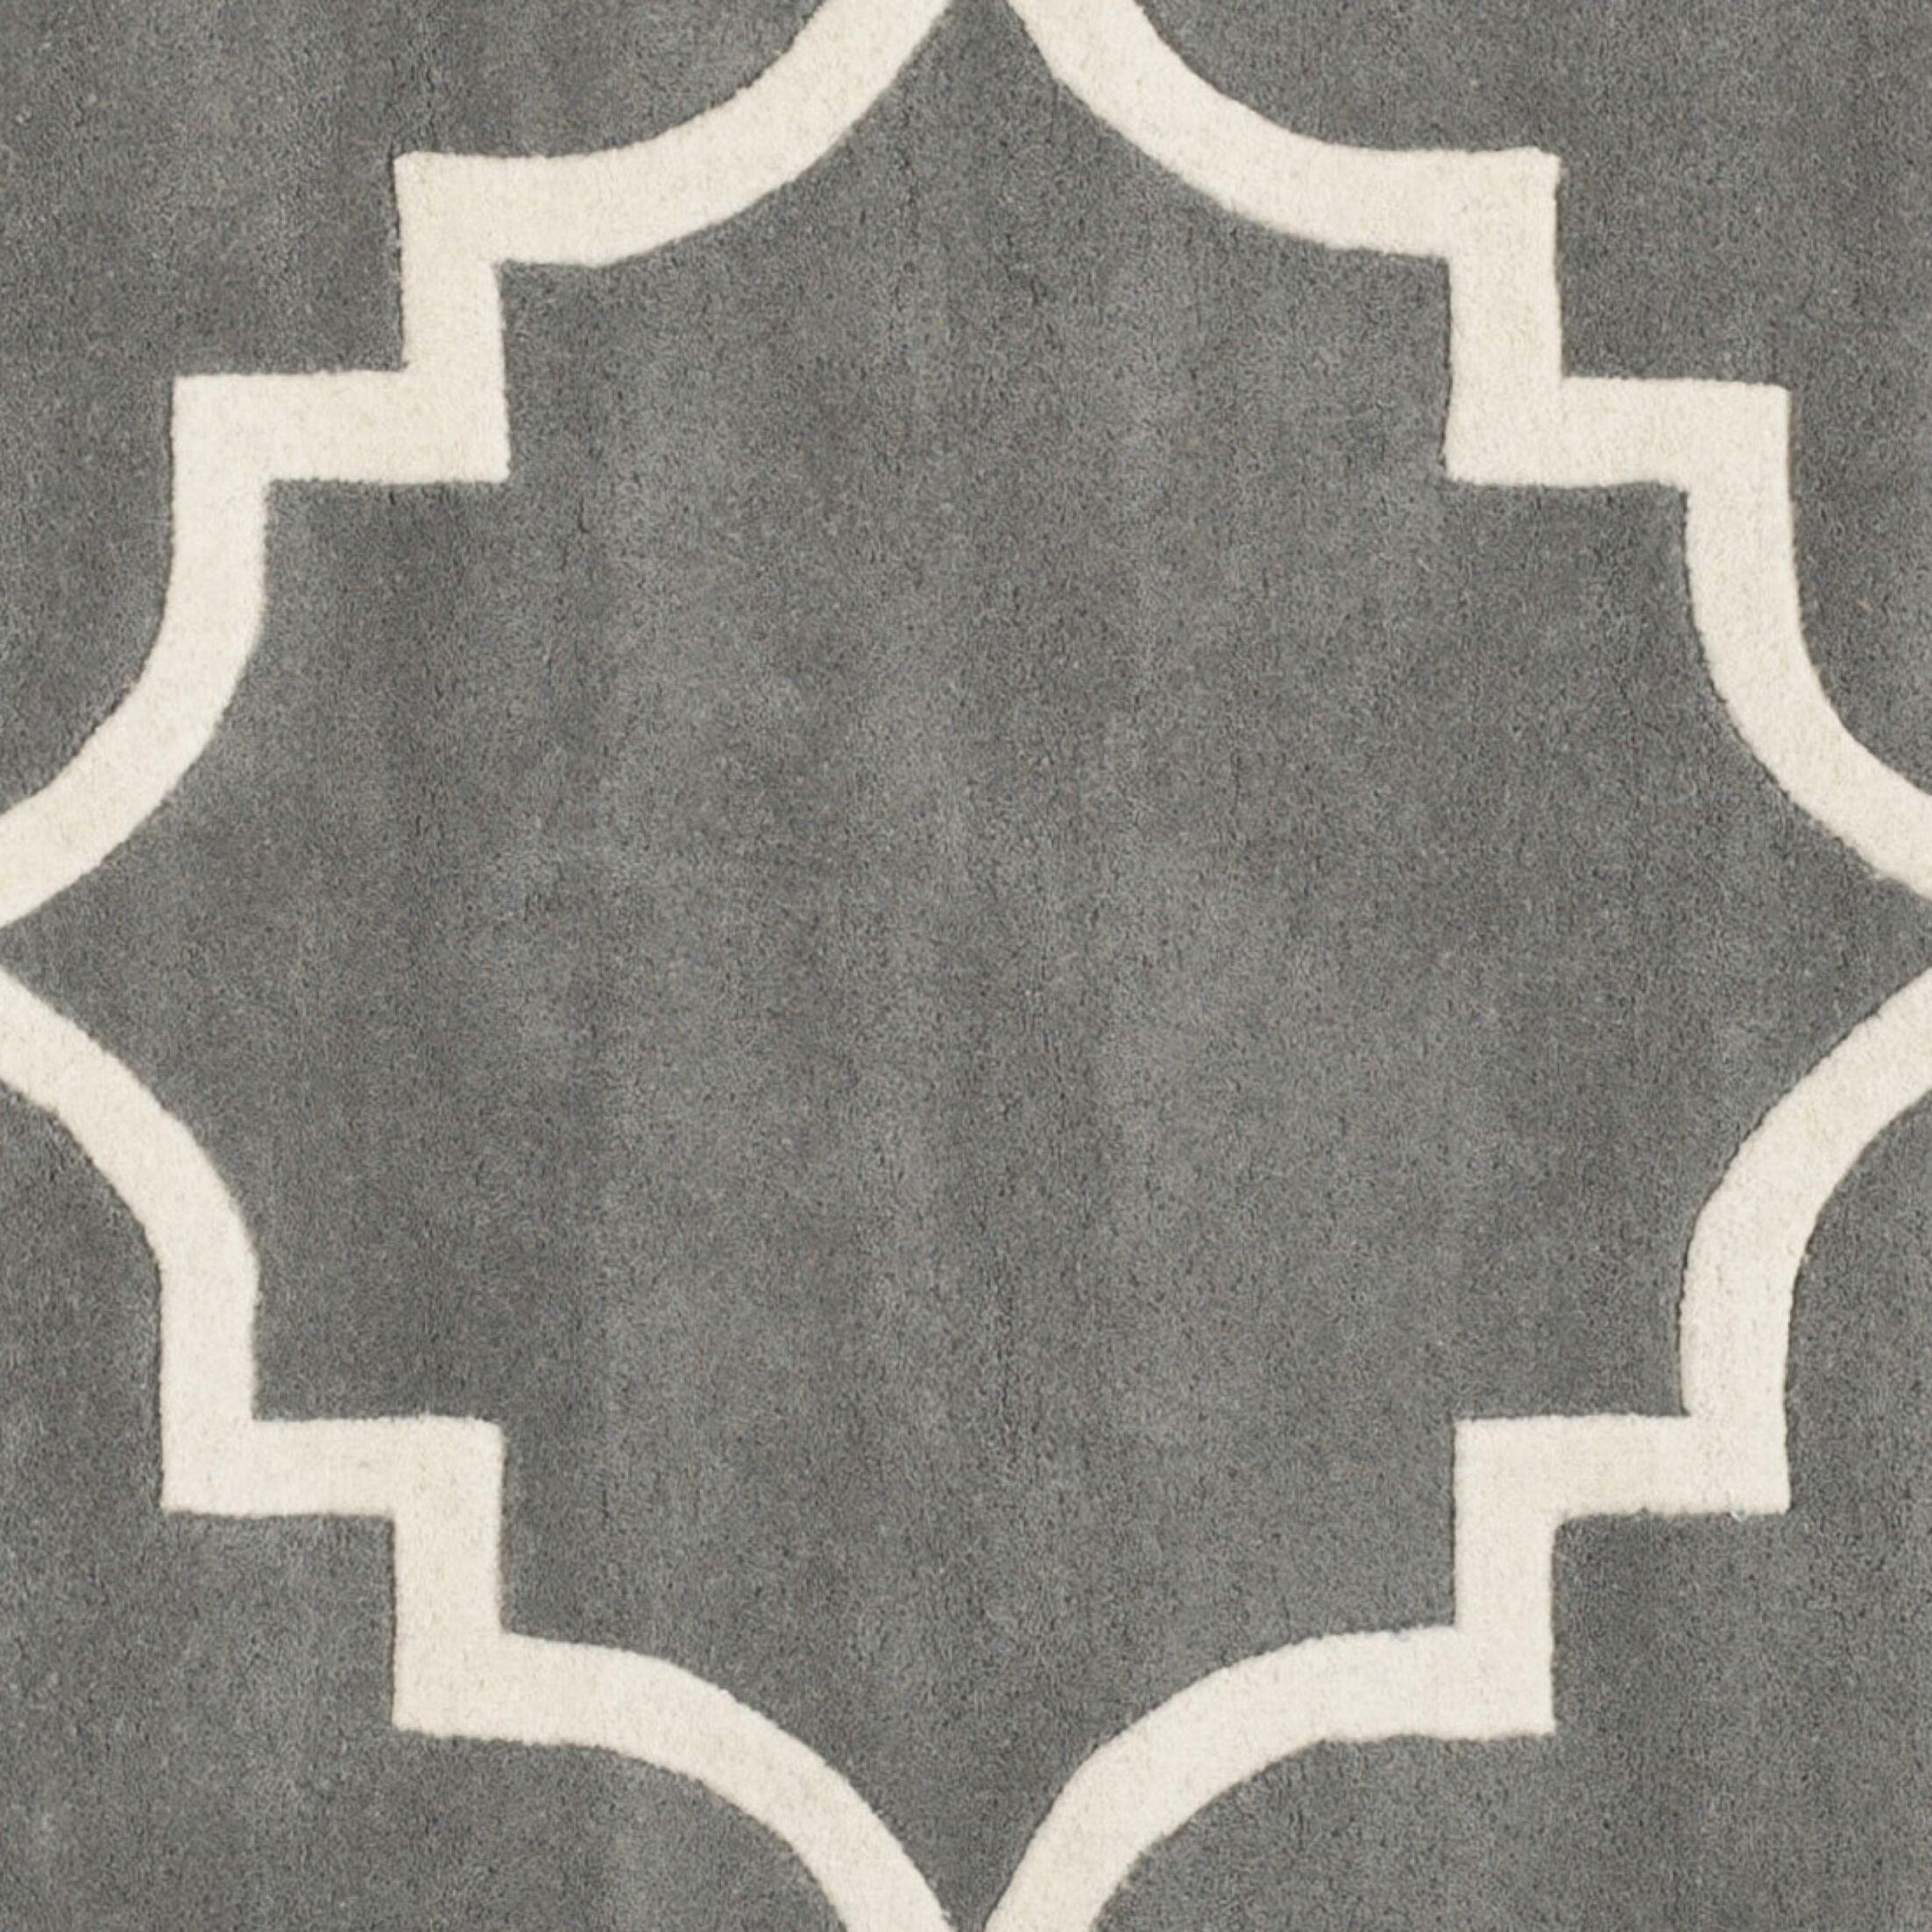 Wilkin Hand-Tufted Wool Dark Gray Area Rug Rug Size: Rectangle 4' x 6'